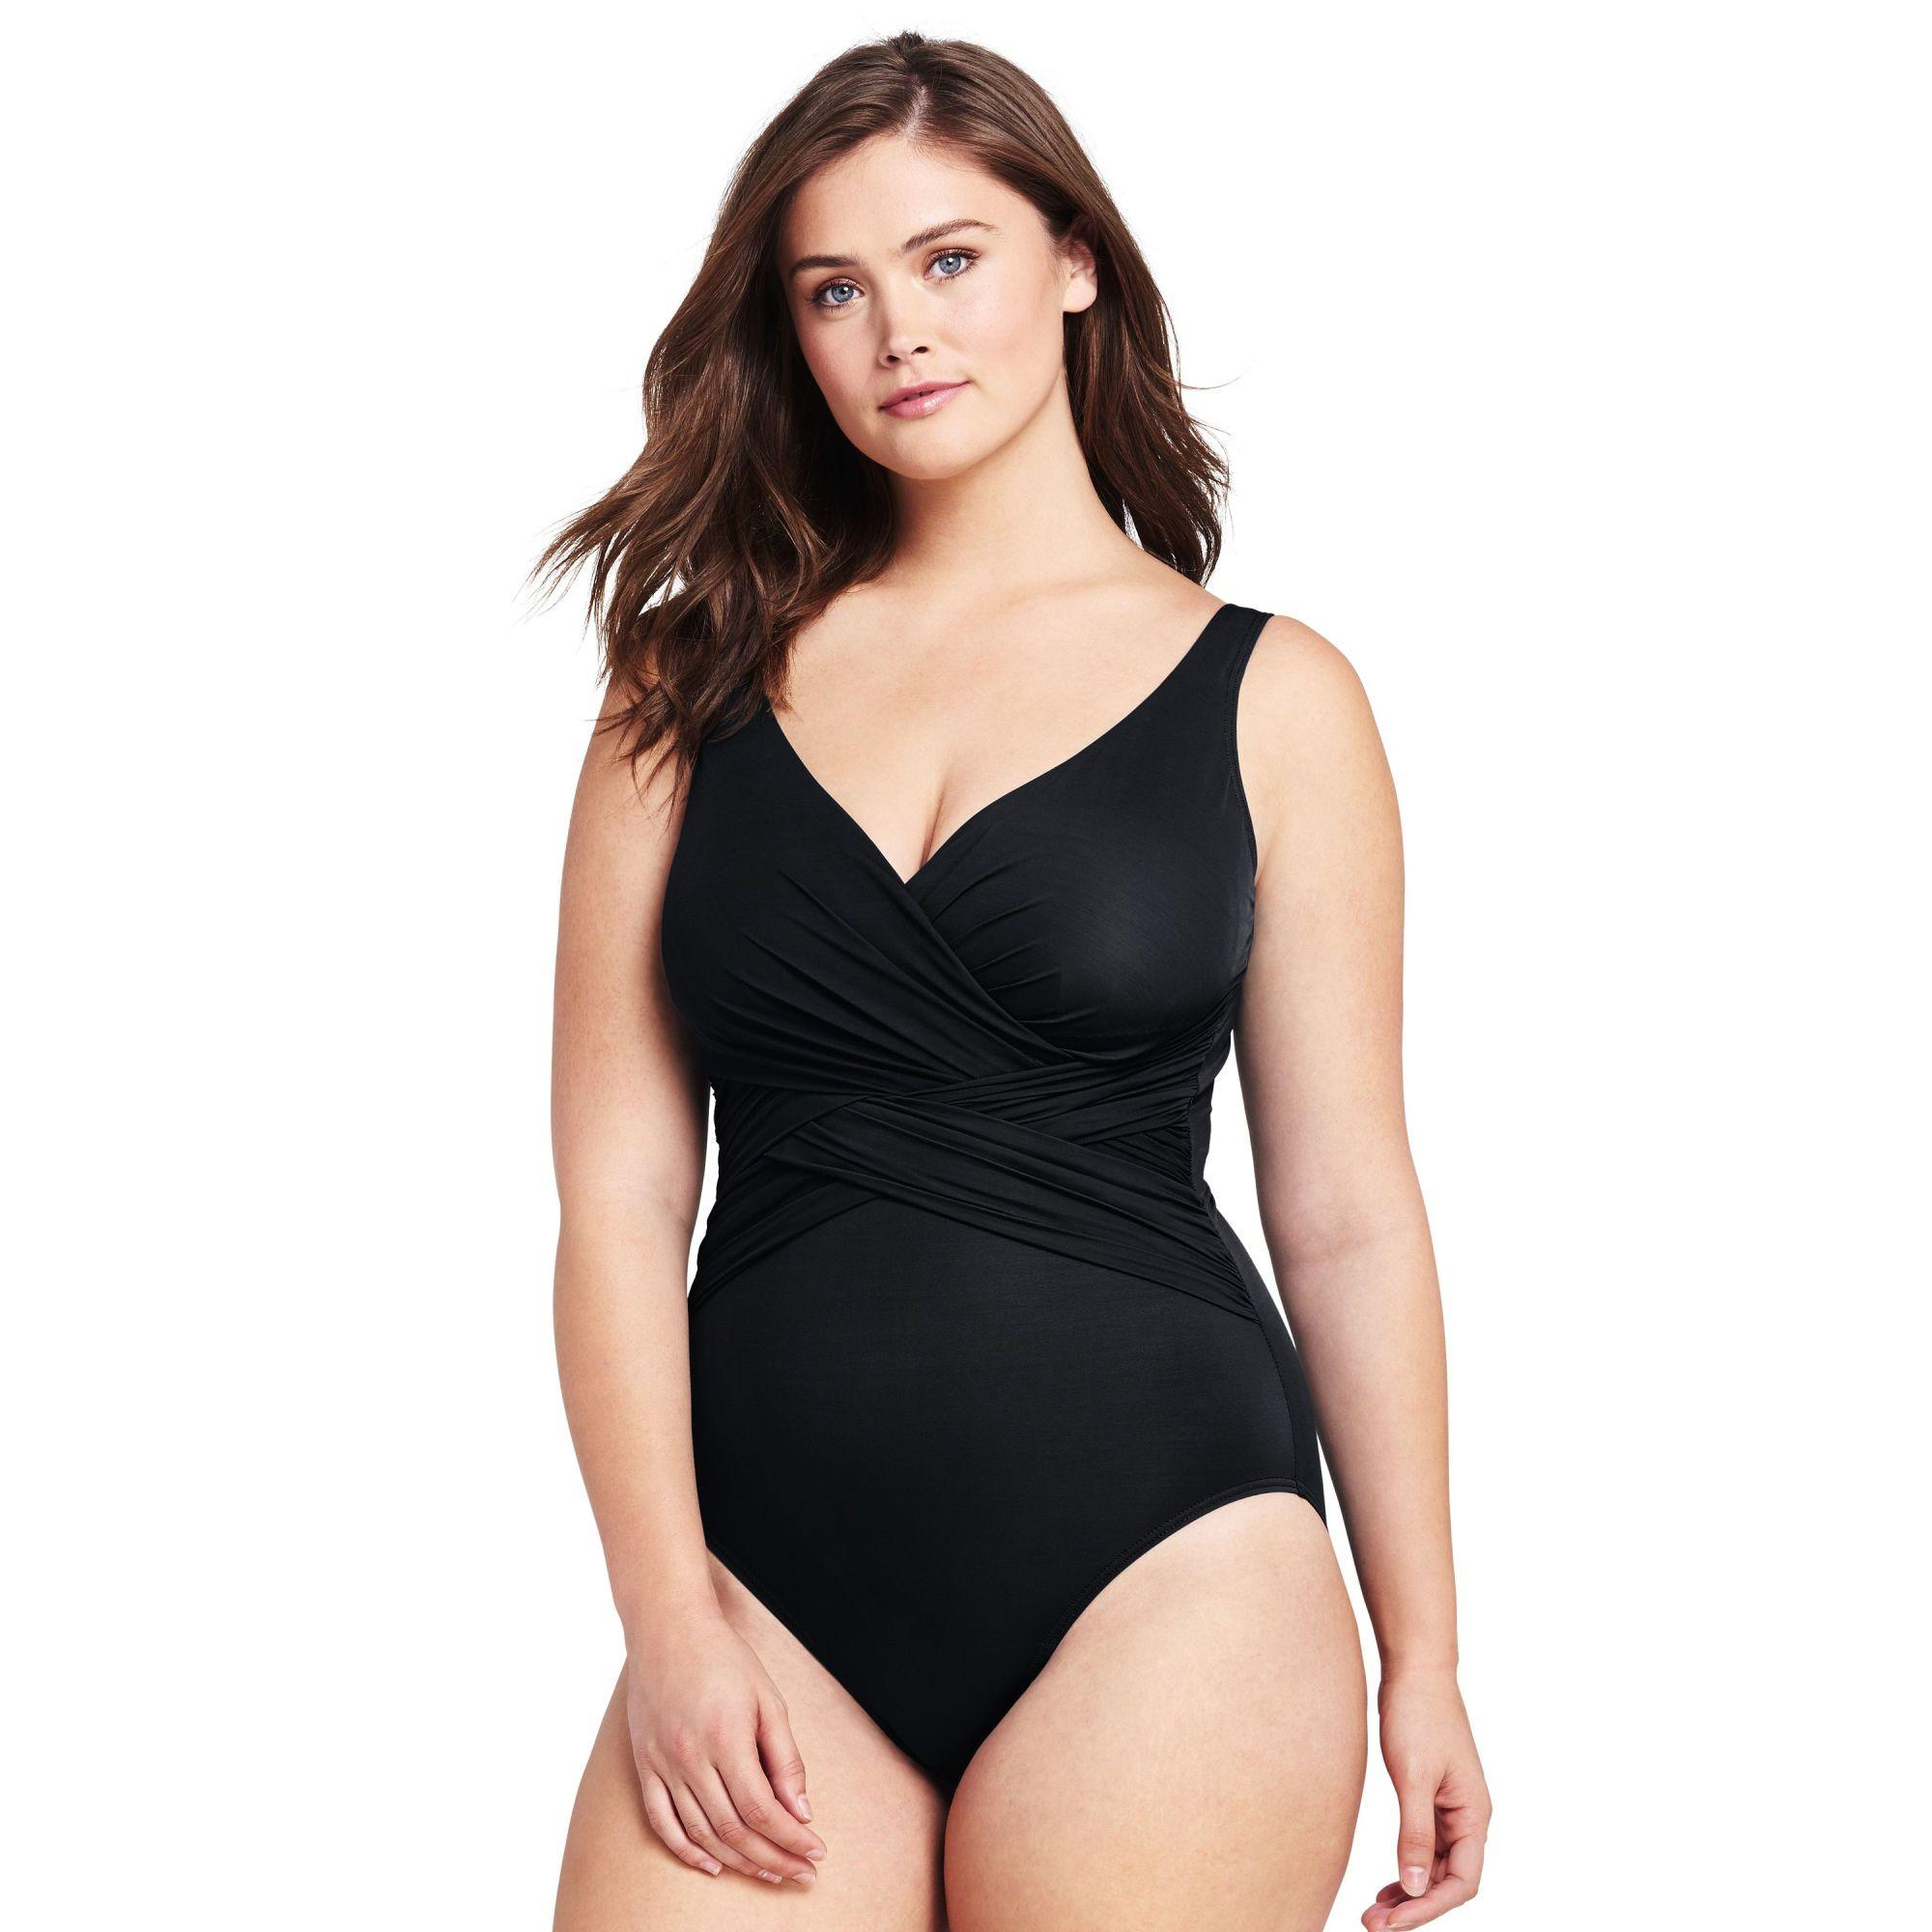 d58c6666fa2 Lands' End Black Plus Slender Wrap Front Swimsuit in Black - Lyst